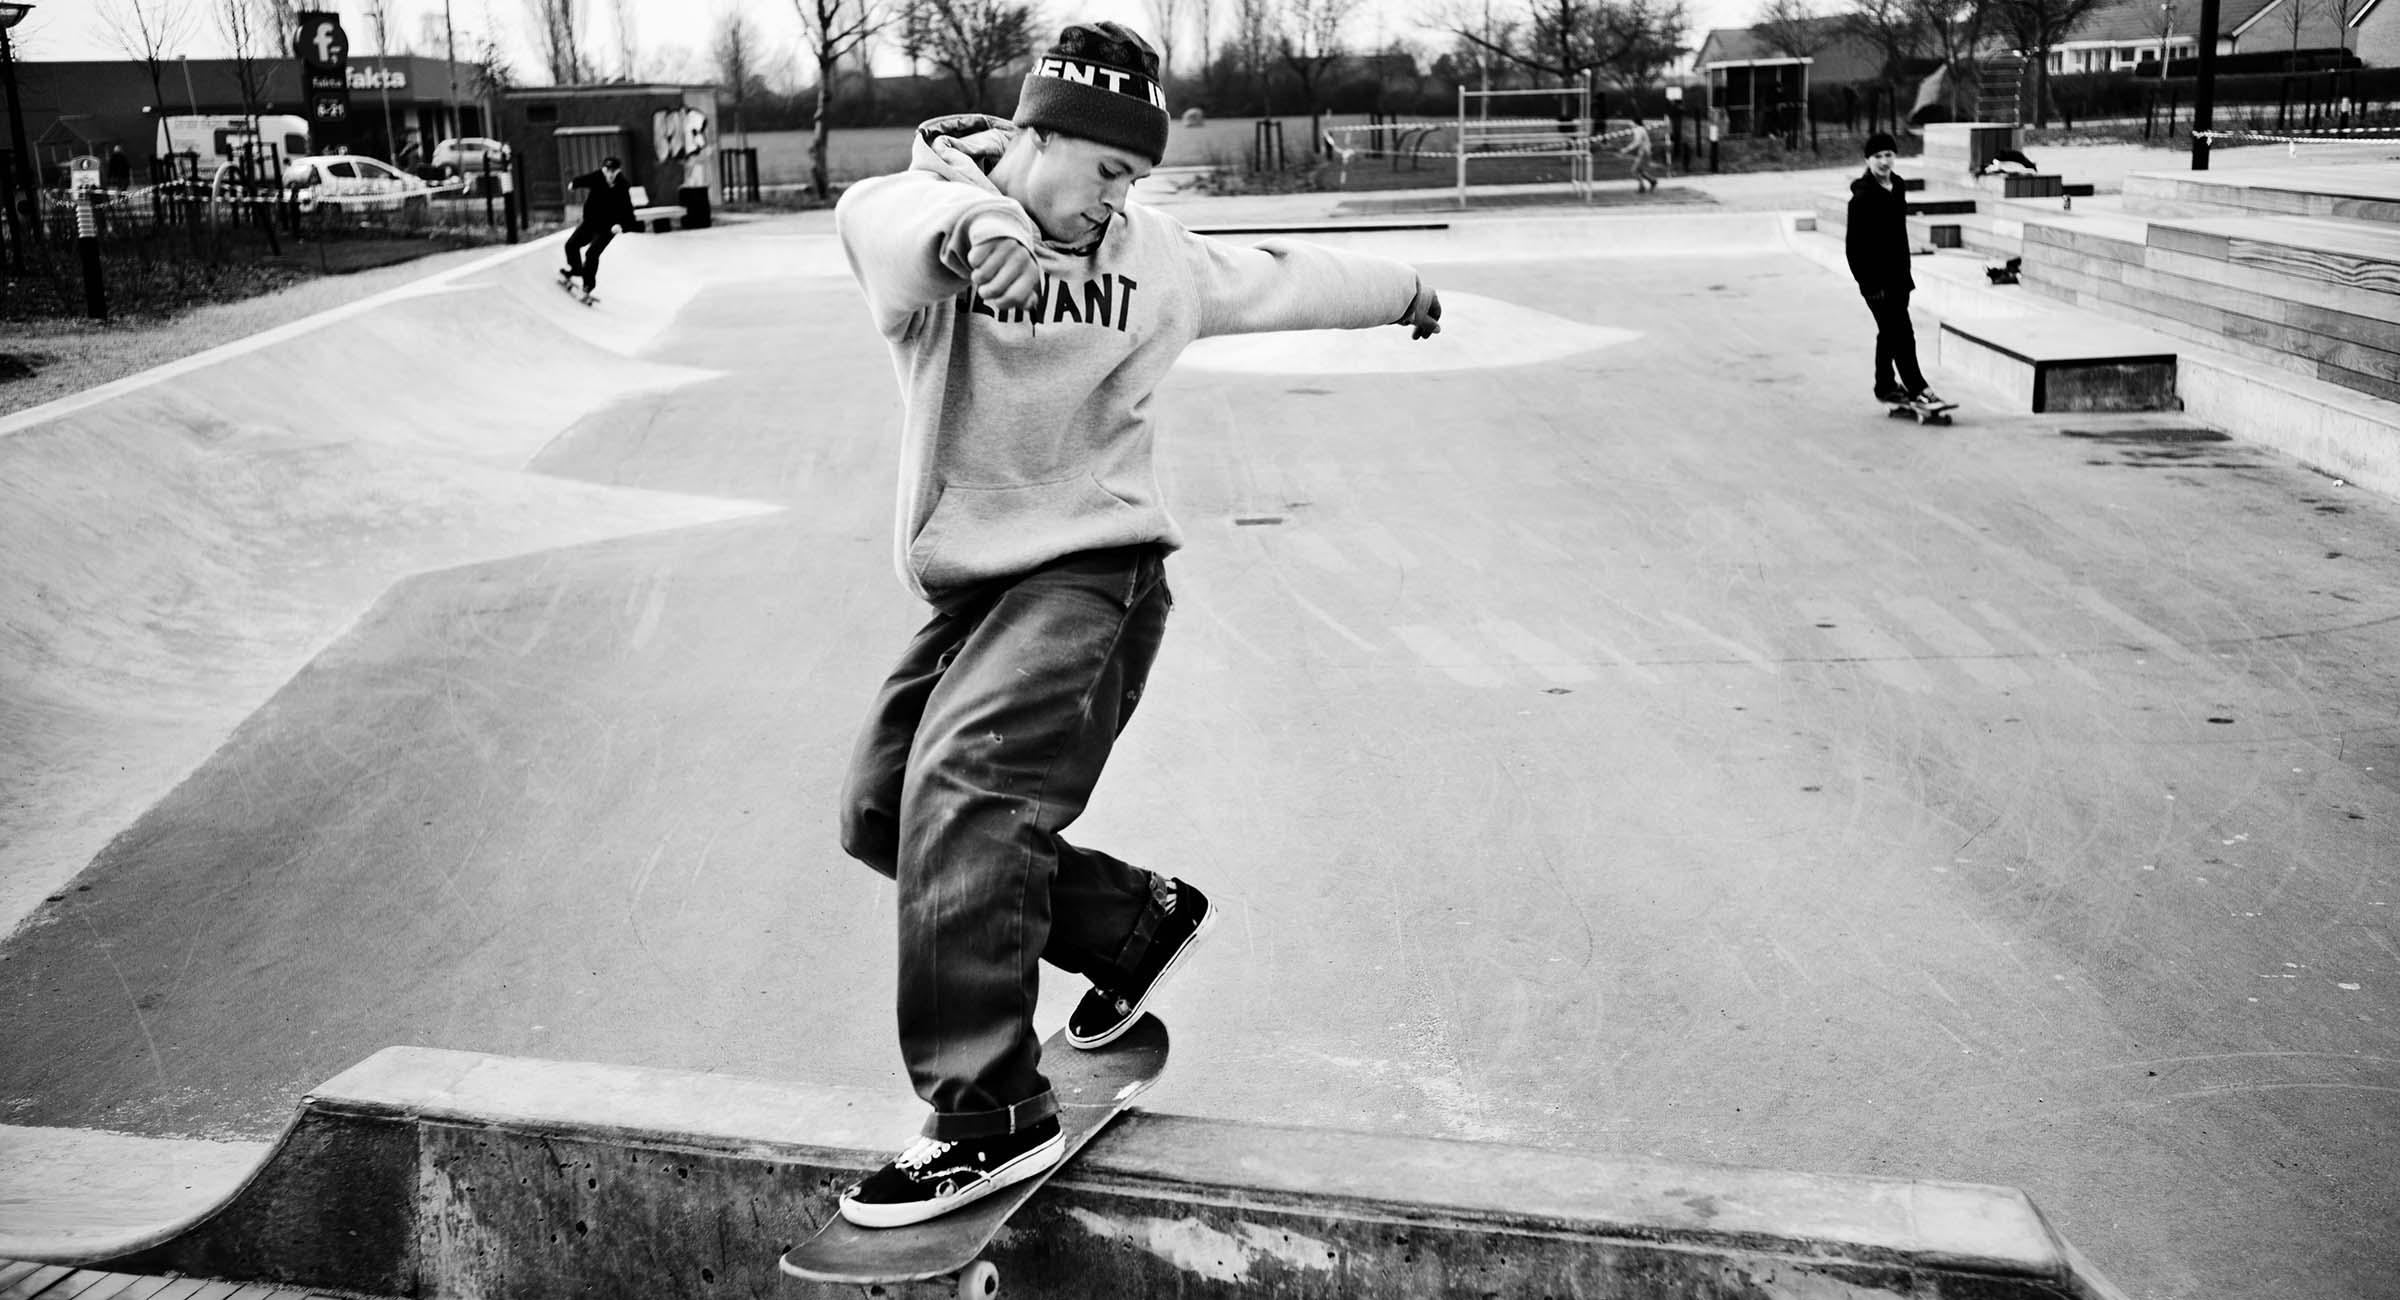 En skater laver frontside rock n roll på en betonrampe